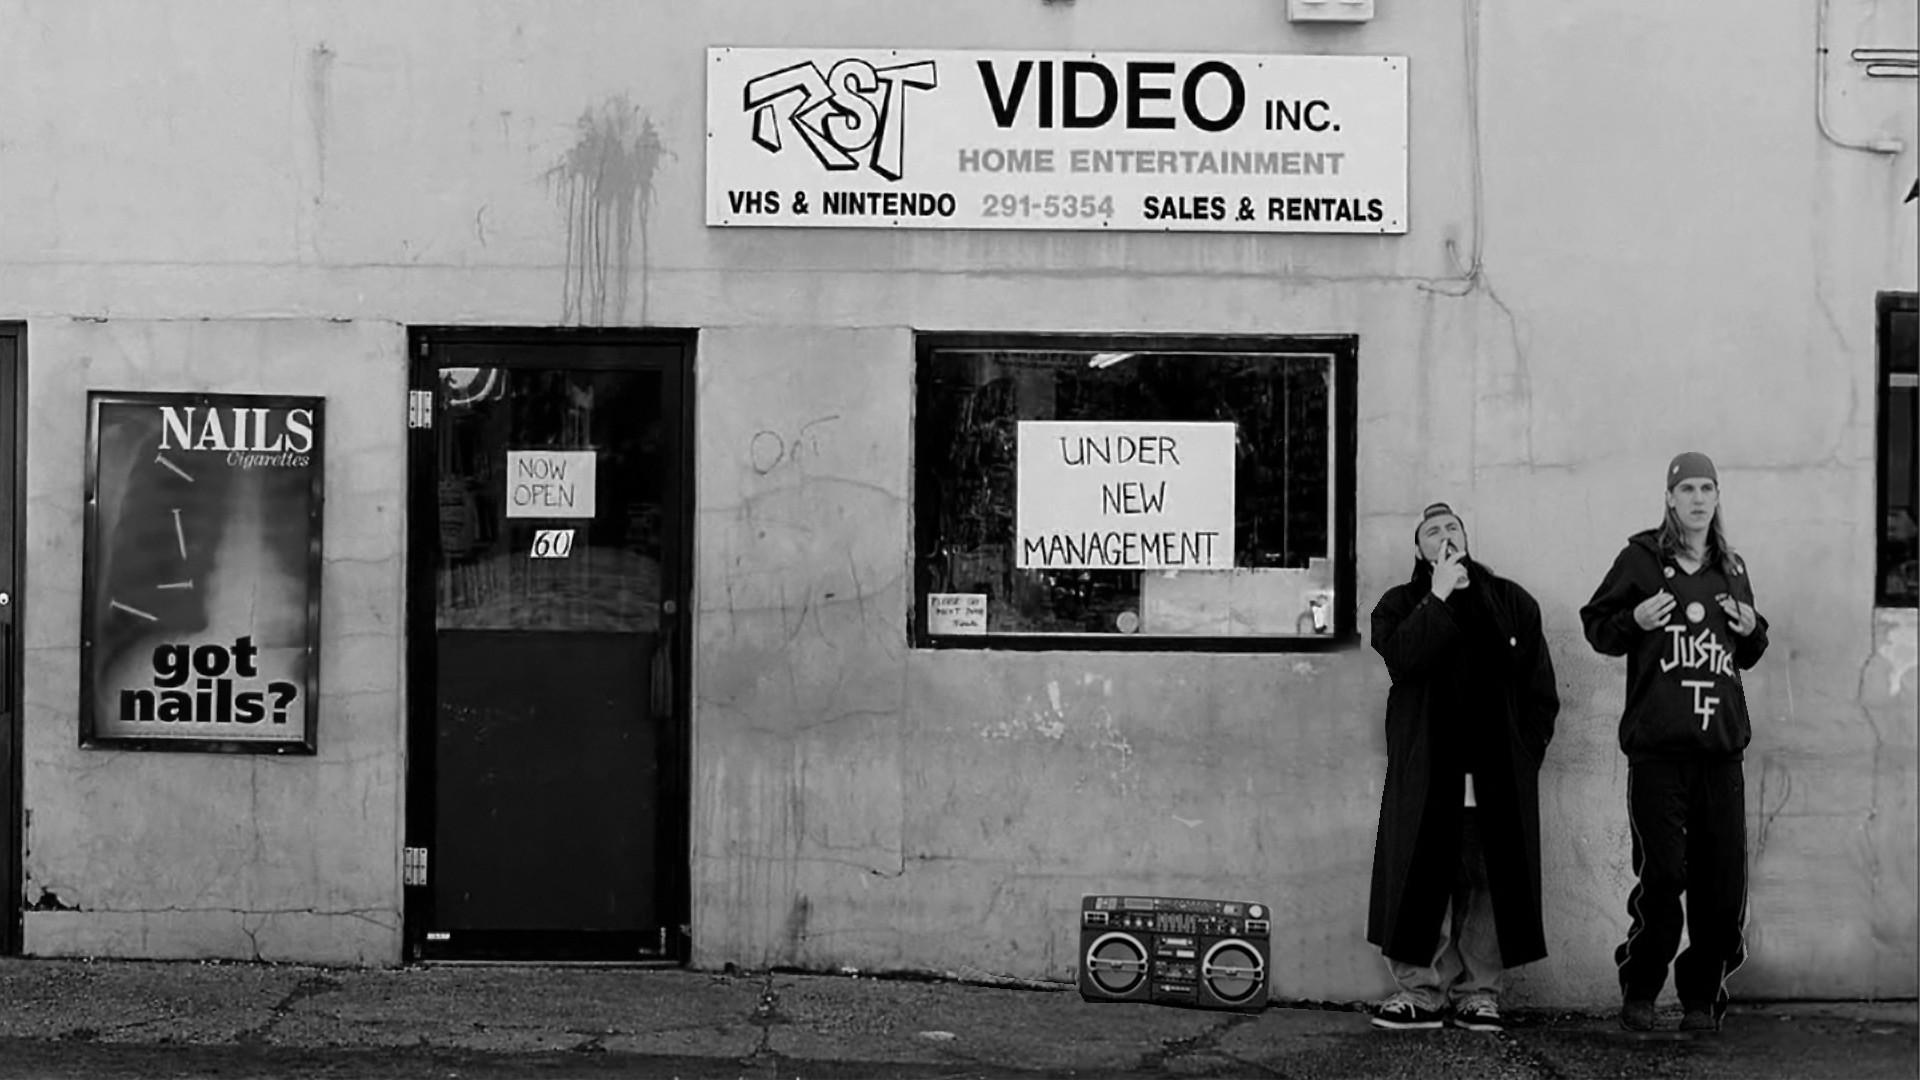 movies-clerks-jay-and-silent-bob-1920x1080-68317.jpg